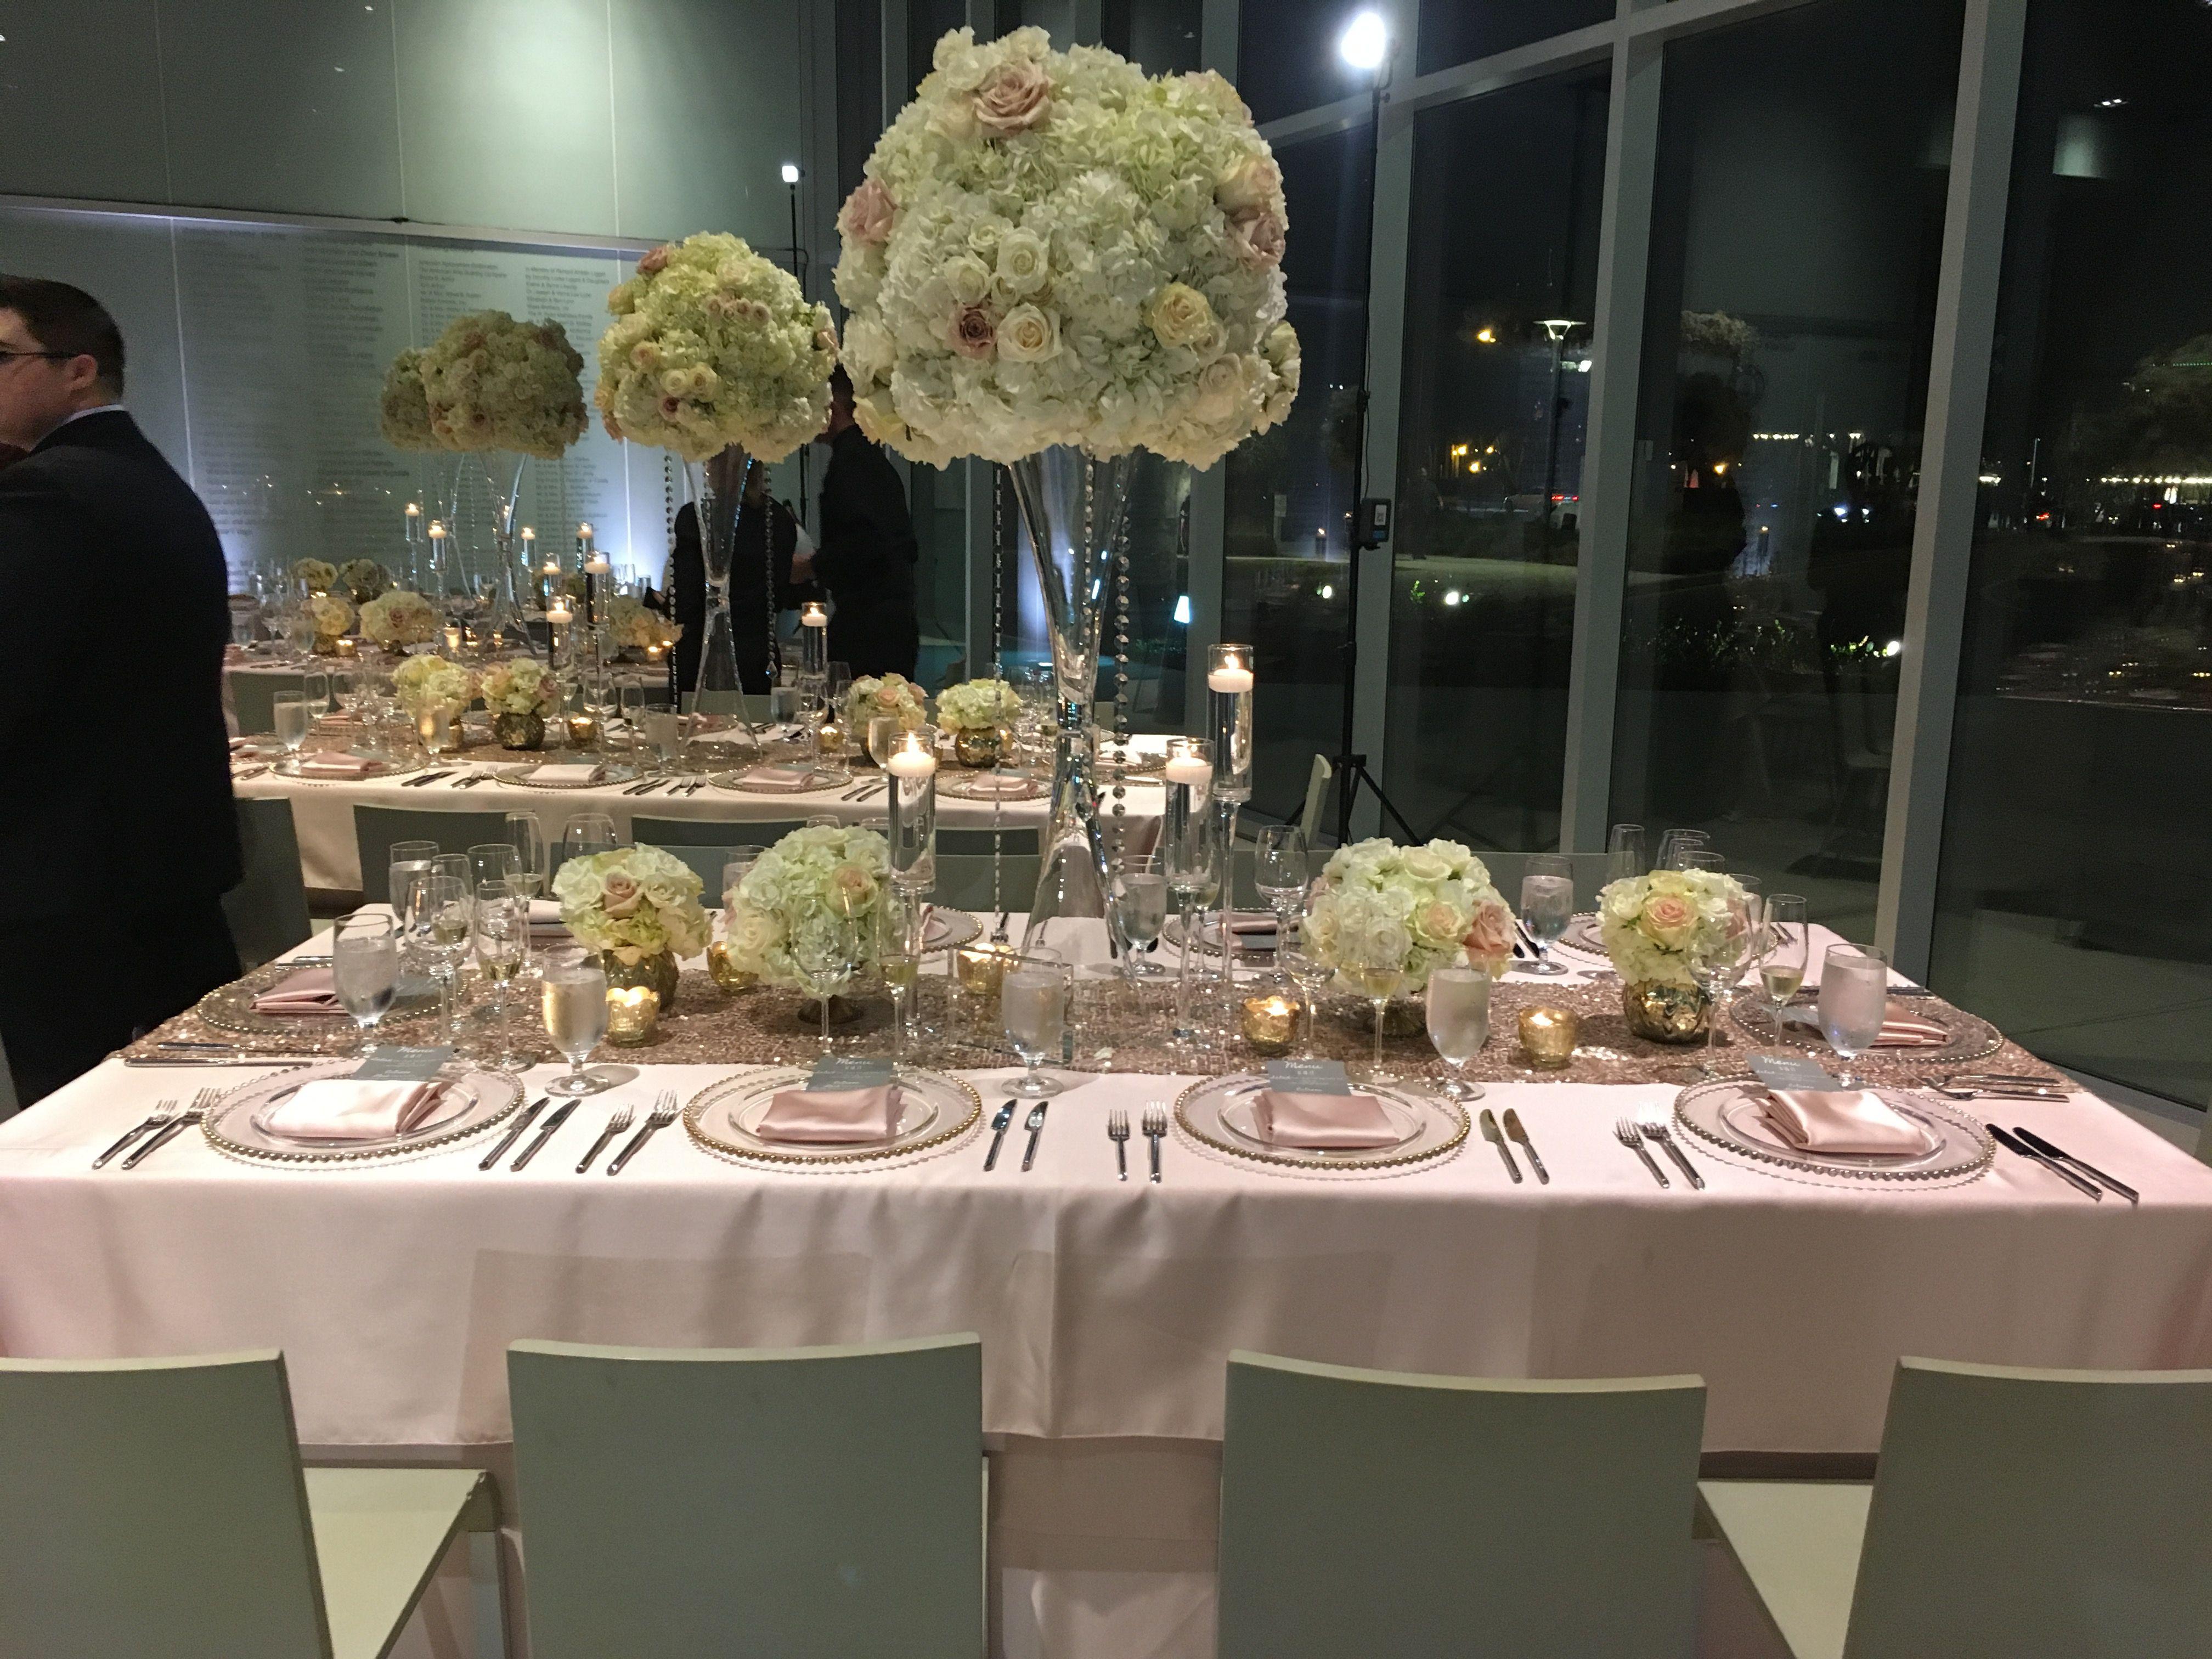 Tampa Museum of Art | Wedding Venues | Pinterest | Wedding venues ...